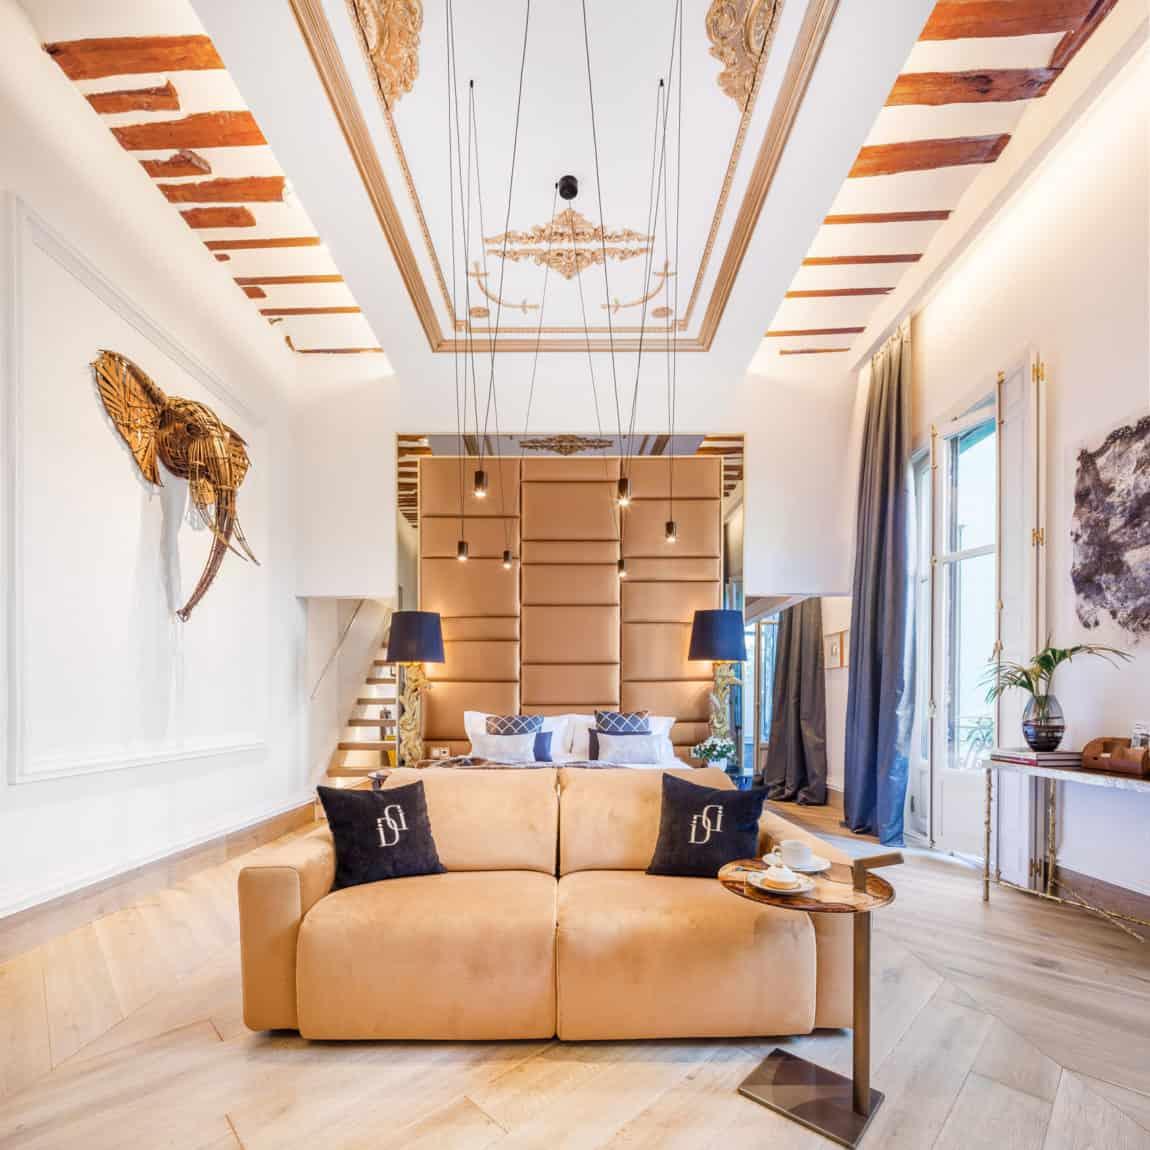 Suite Splendeur by Disak-Diseño de interiores (3)